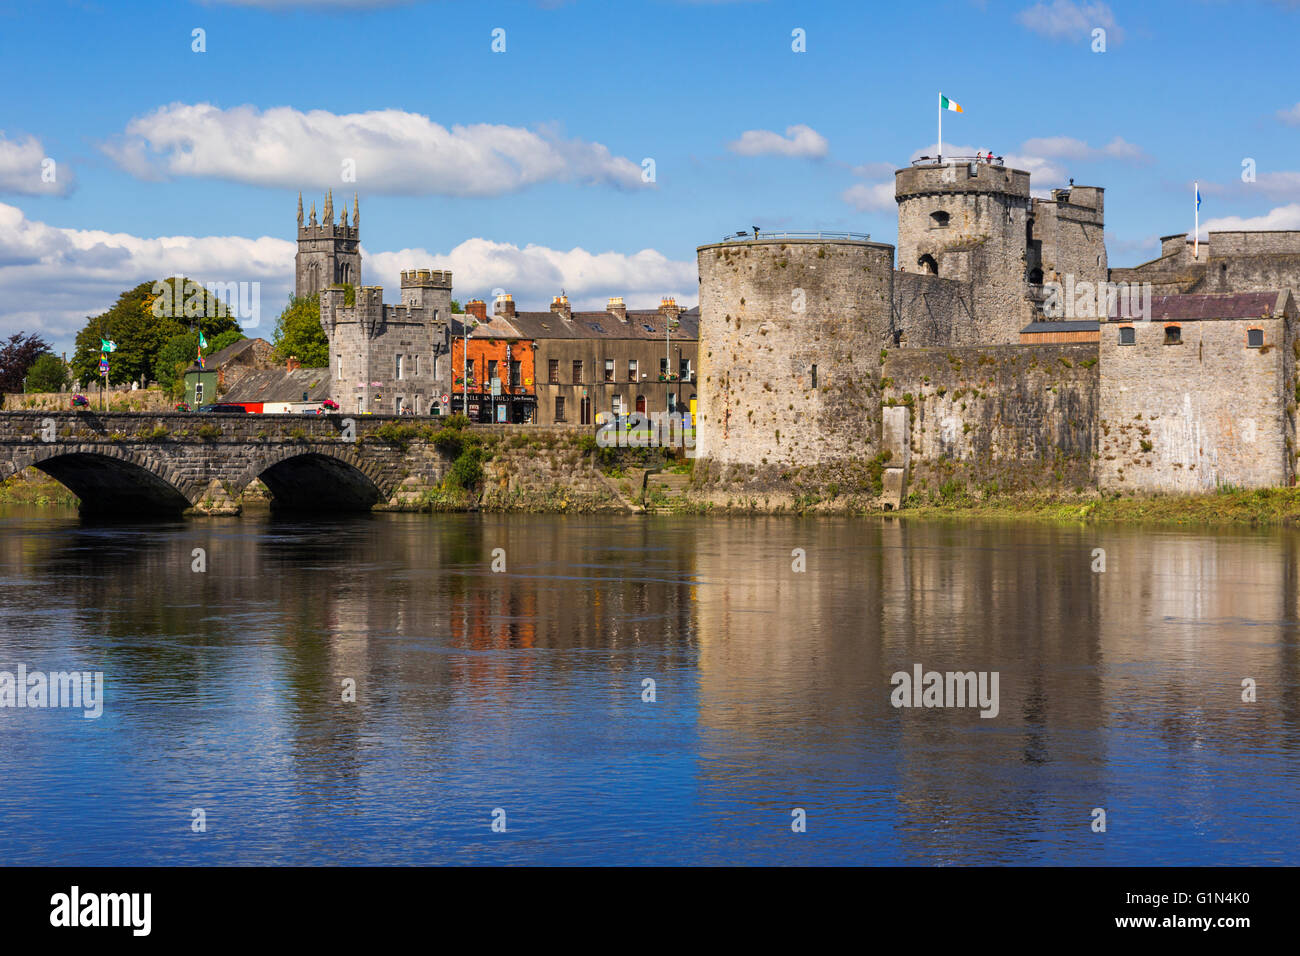 Limerick, County Limerick, Republic of Ireland.  Eire.  13th-century King John's Castle seen across the River Shannon. - Stock Image